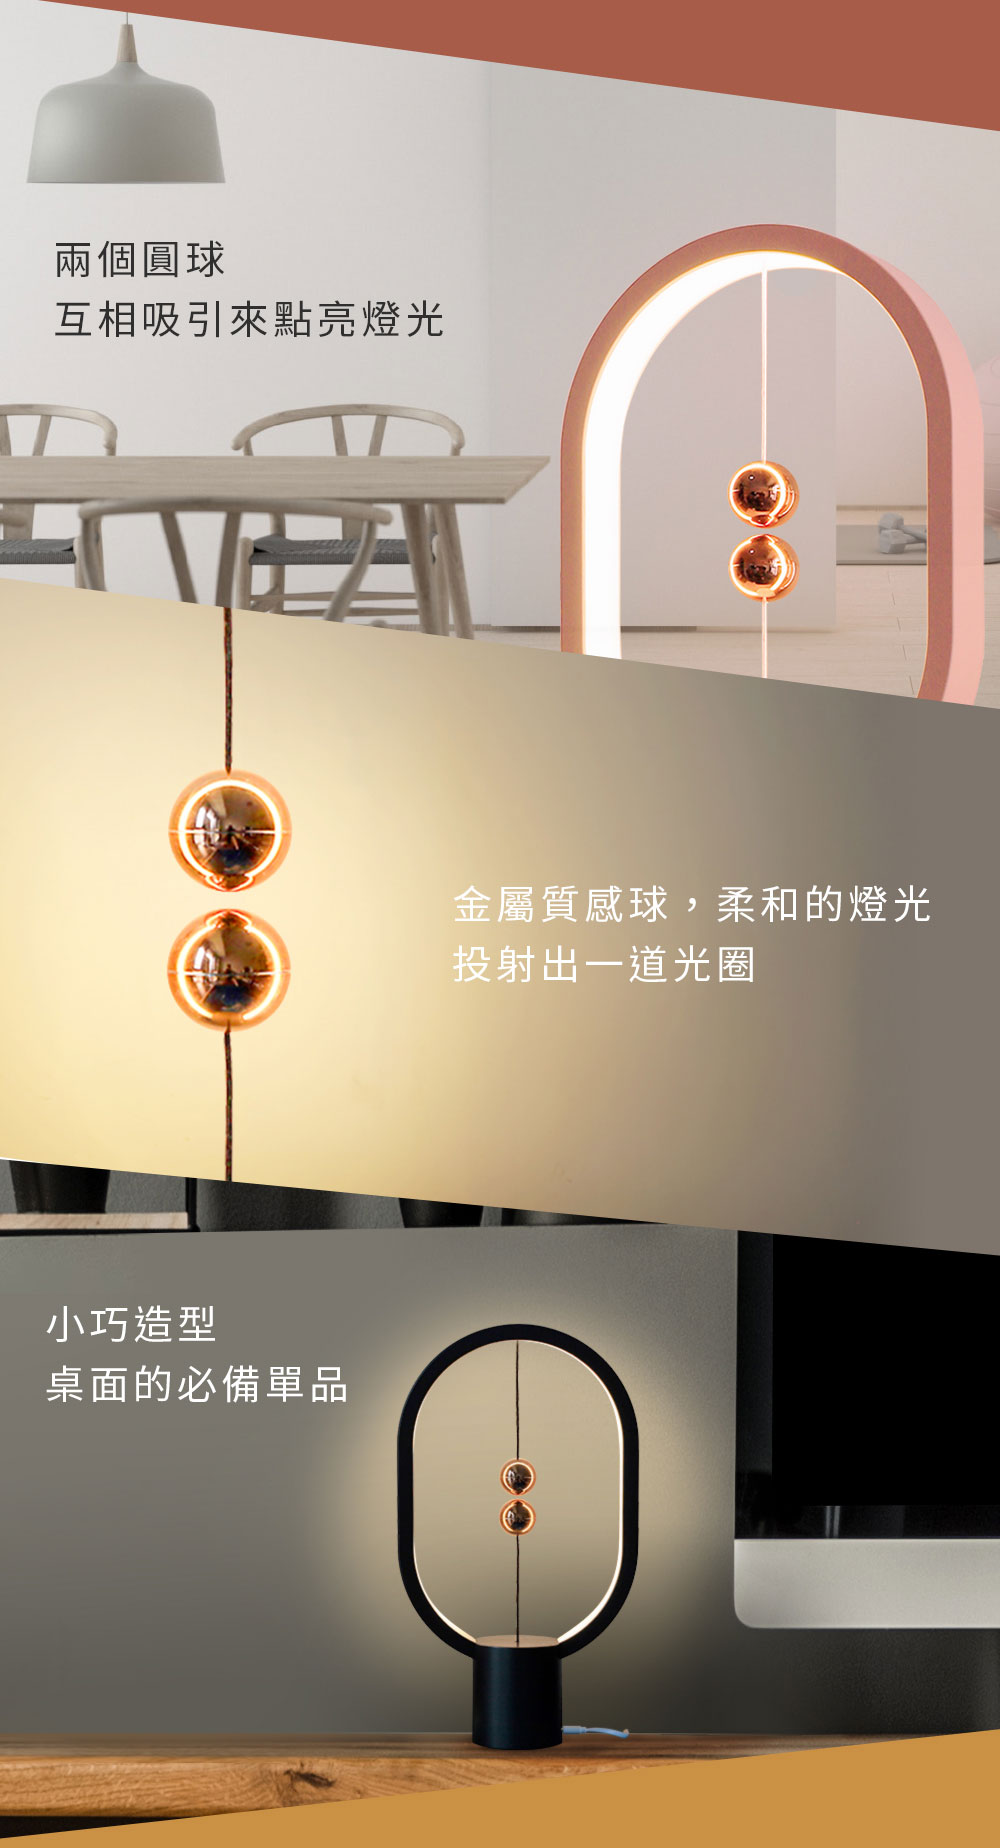 ZAN DESIGN - Heng PRO 衡燈mini 2.0 橢圓 (櫻花粉)